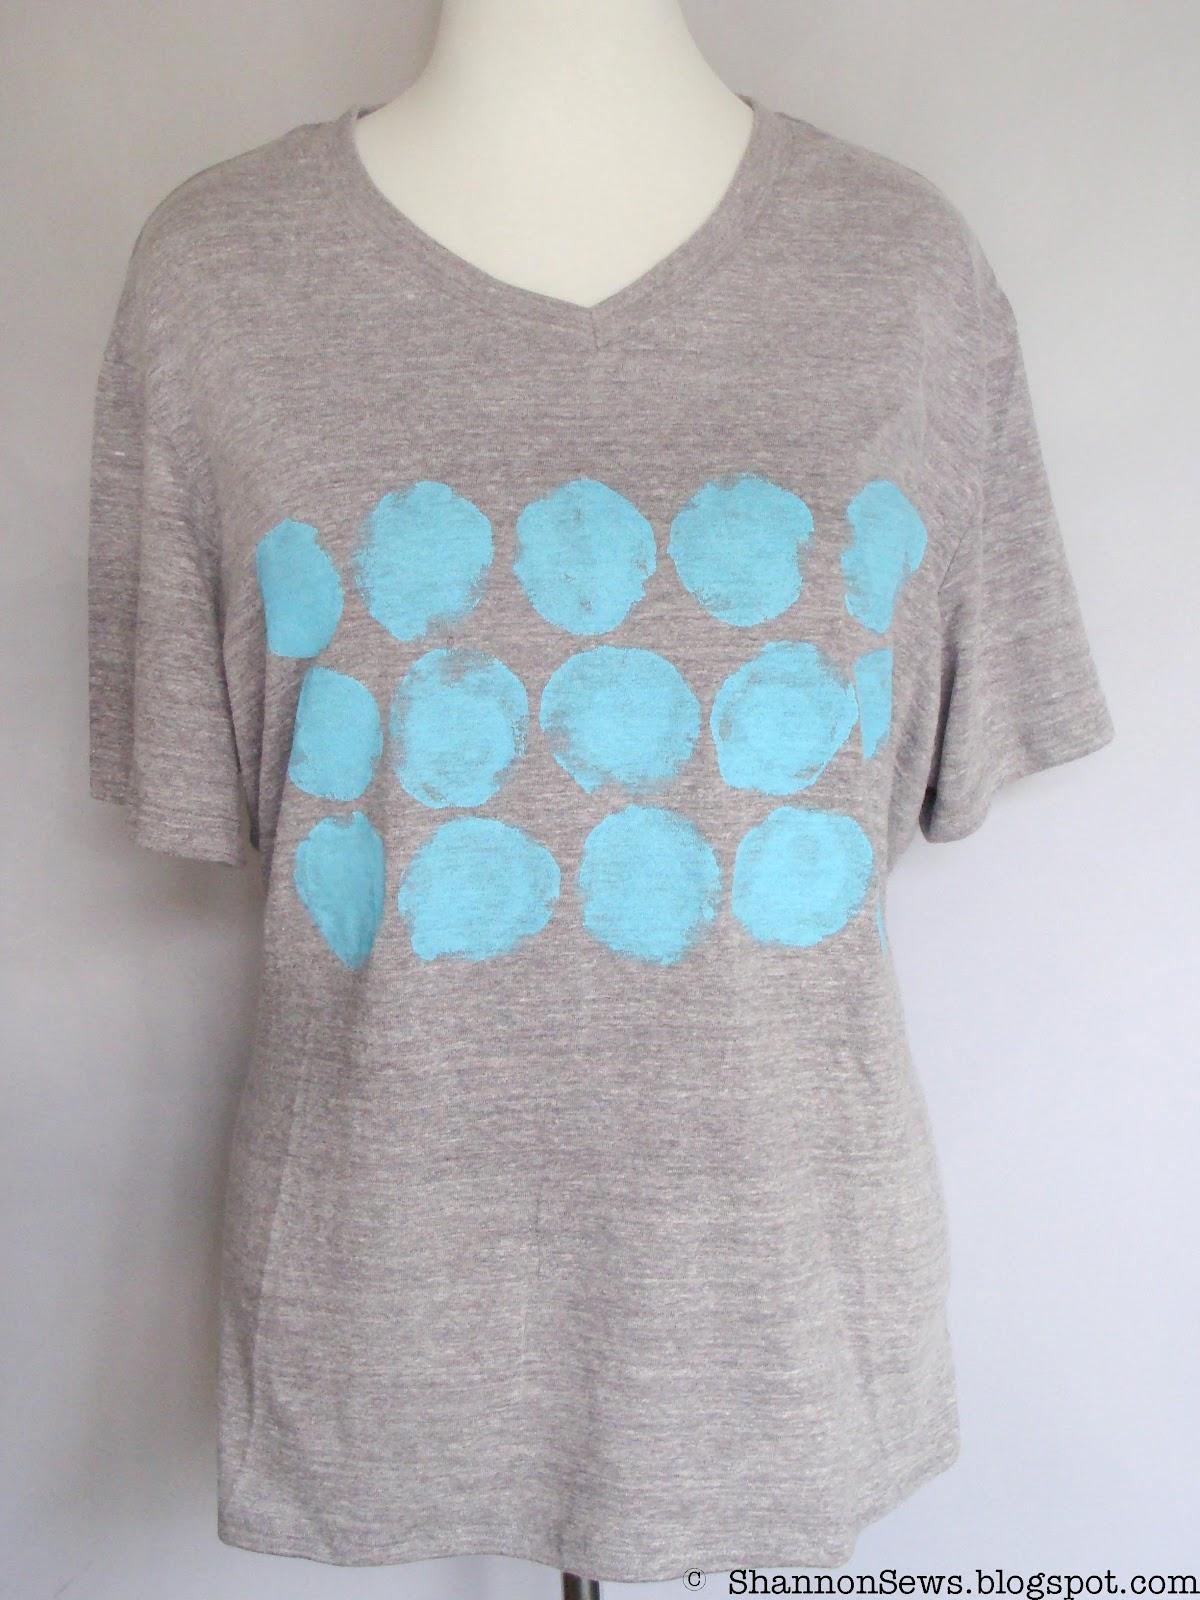 Sewing, Tutorials, Crafts, DIY, Handmade | Shannon Sews | blog for ...